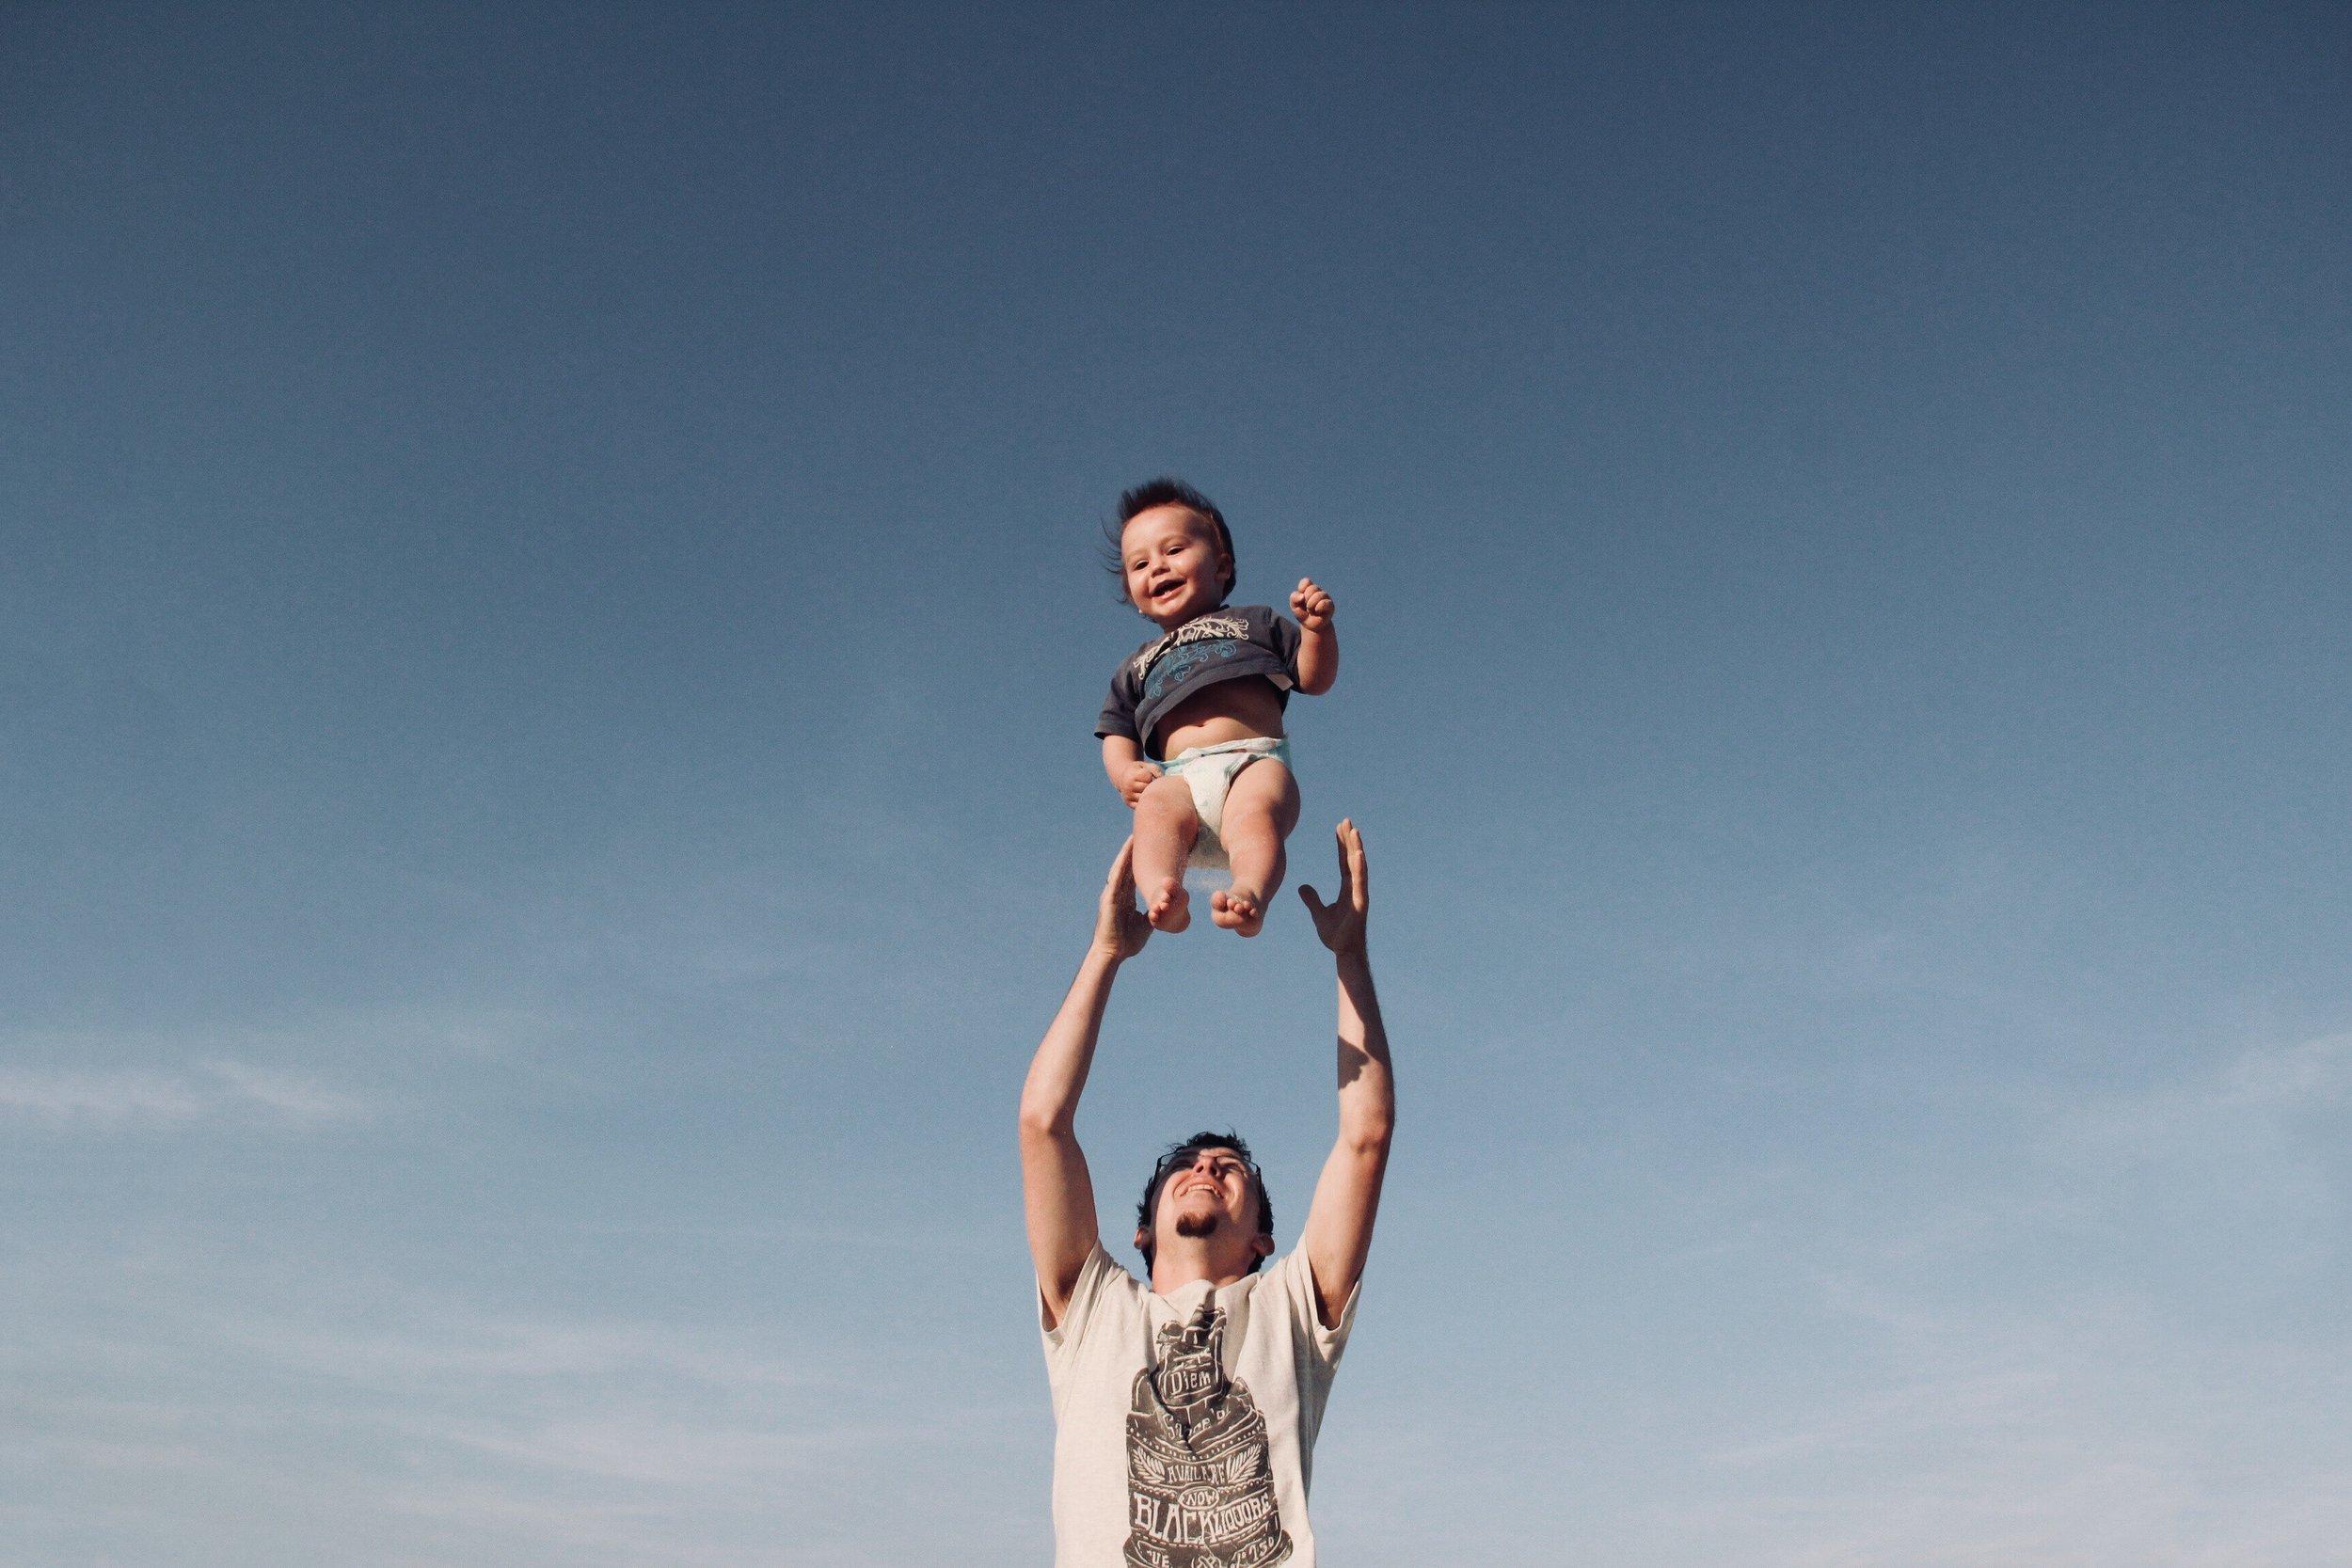 baby-blue-sky-carefree-1166990.jpg